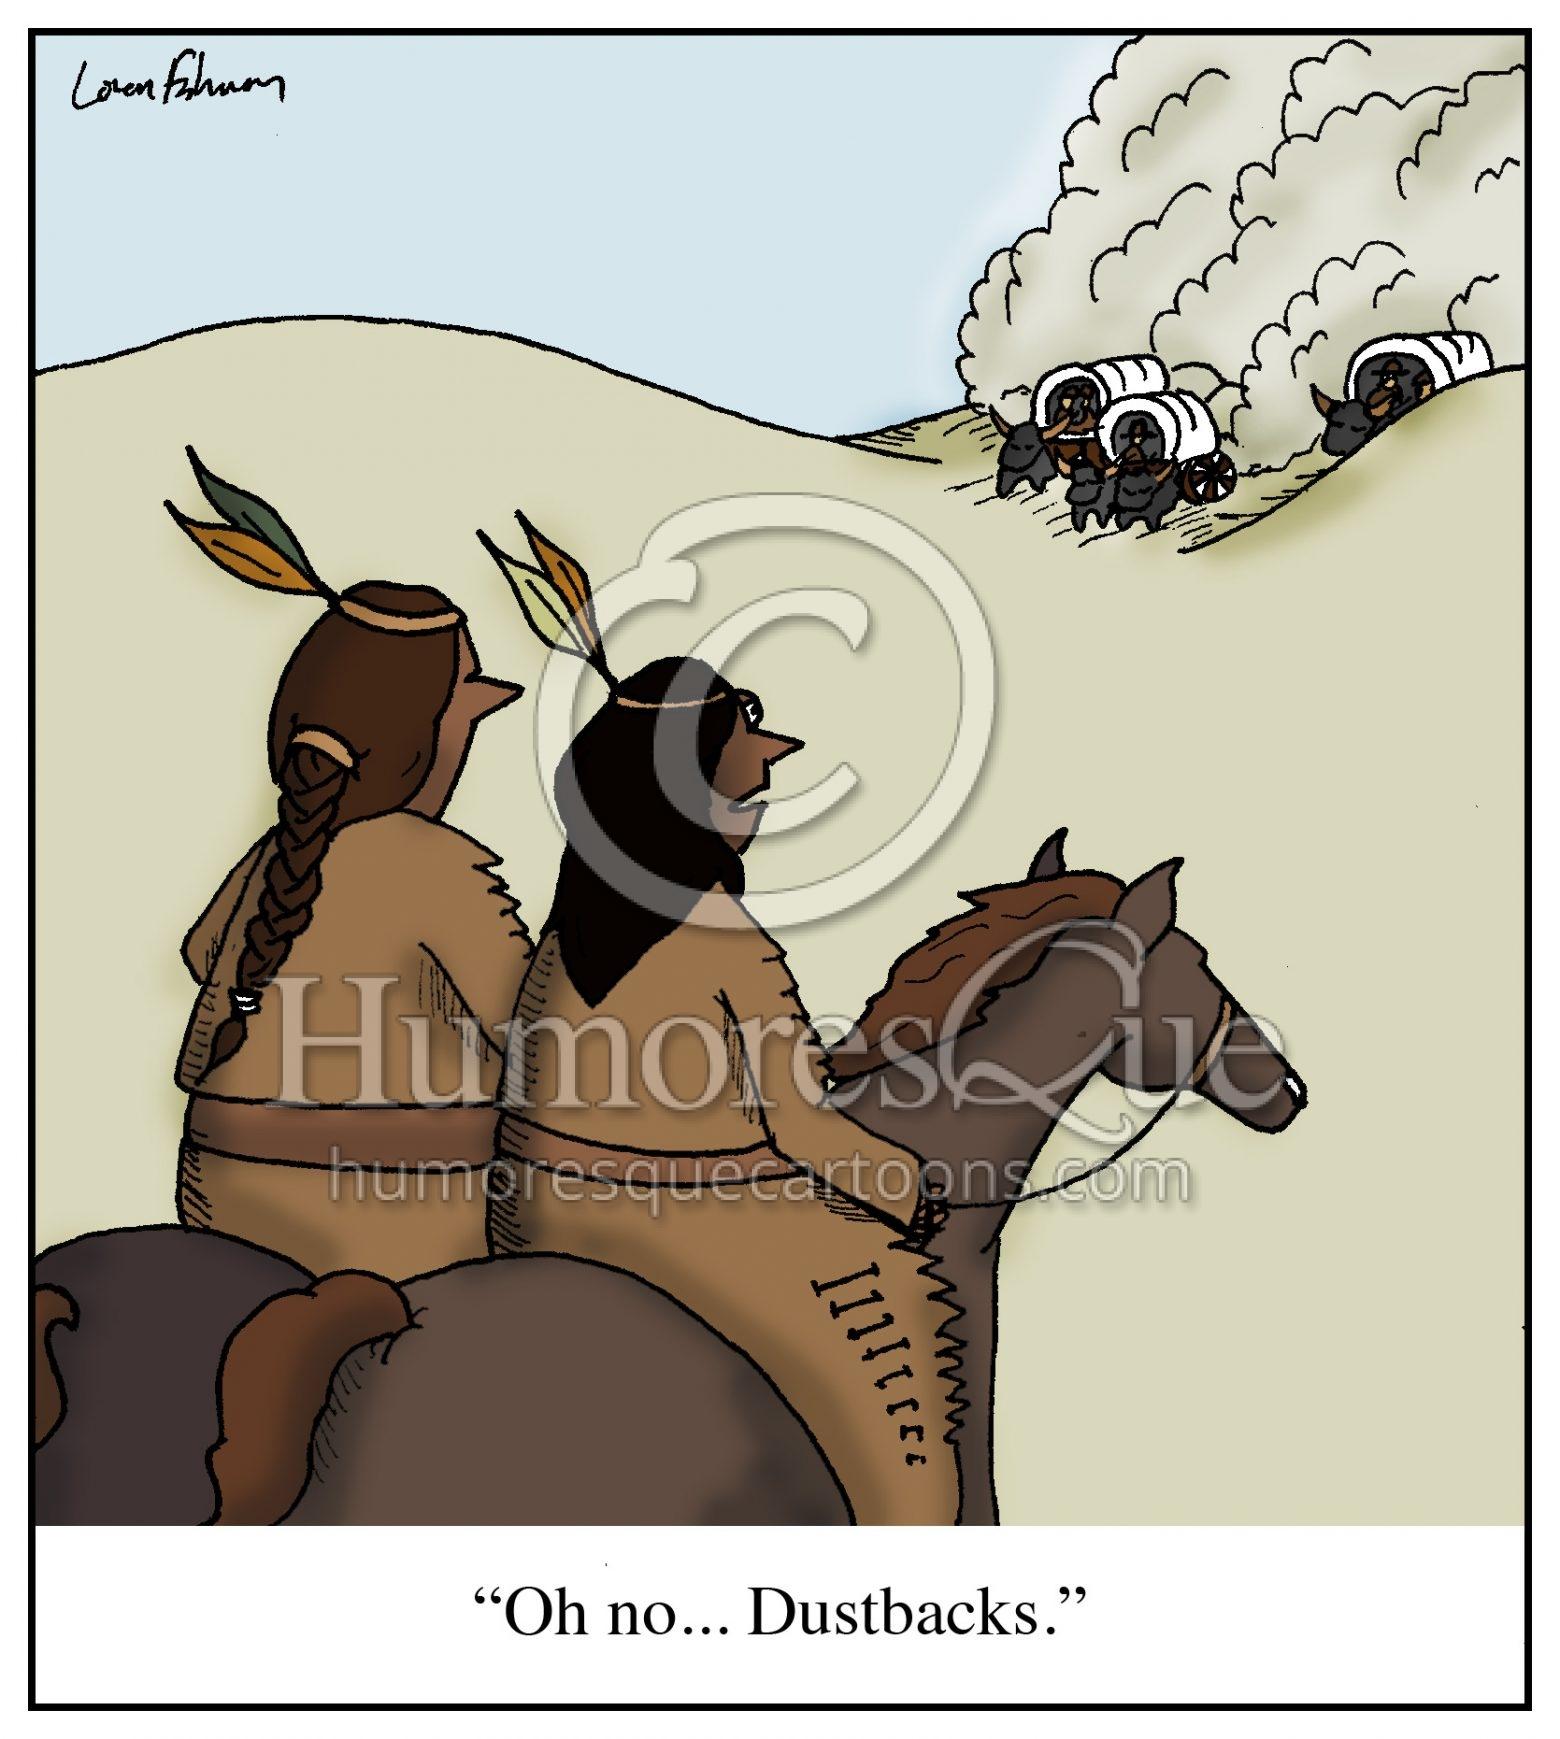 racism against native americans dustbacks cartoon